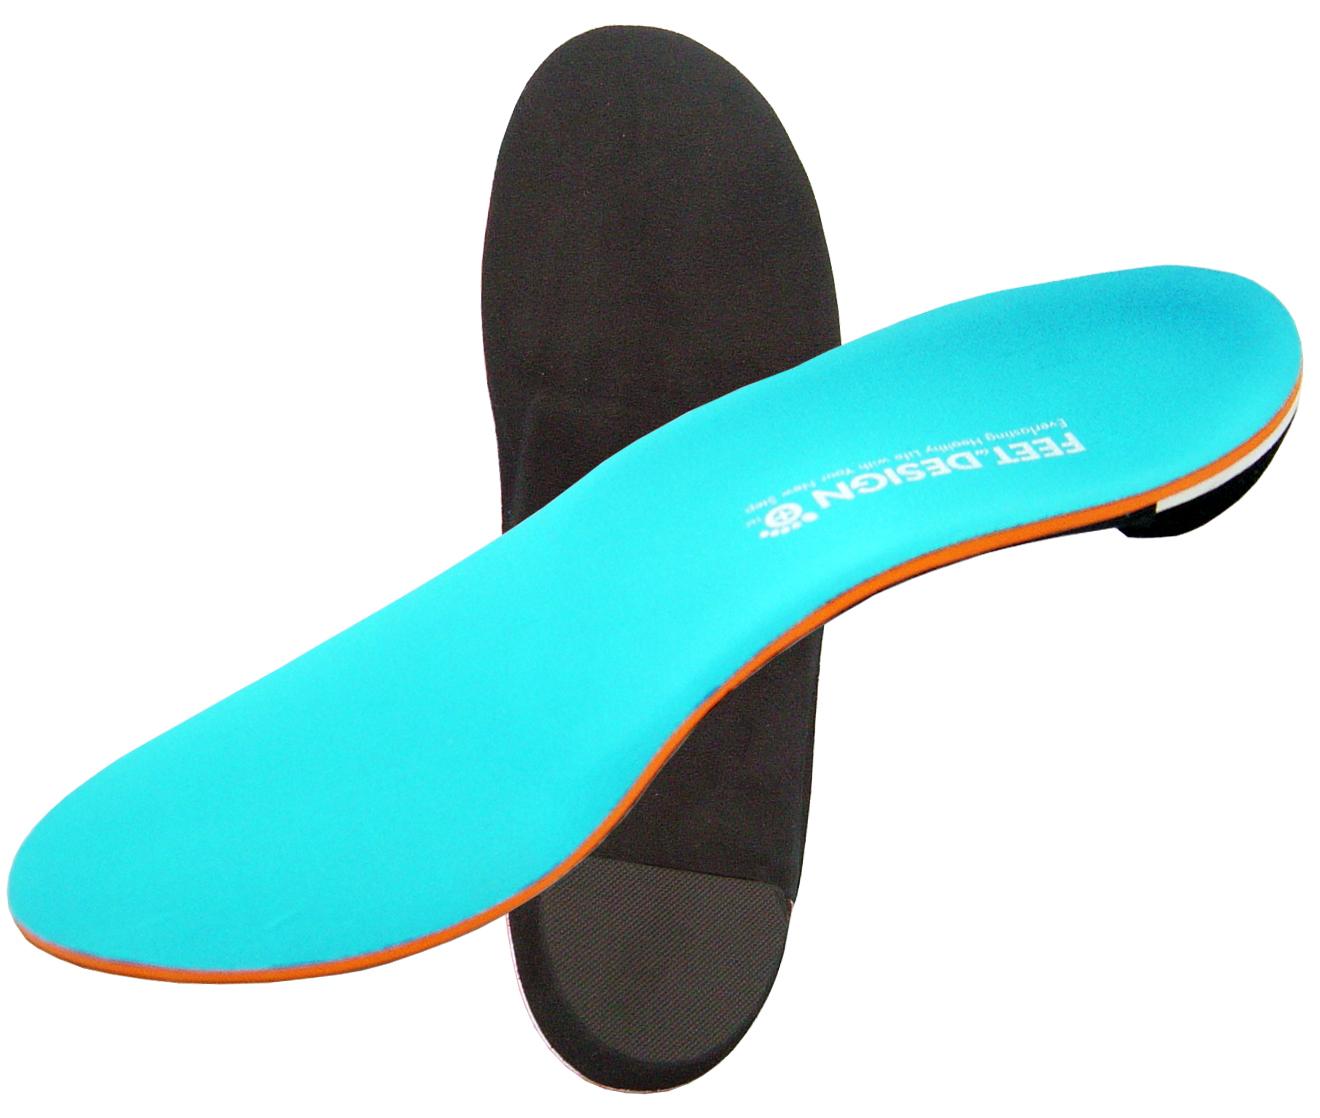 FeetinDesignオーダーメイドインソール02